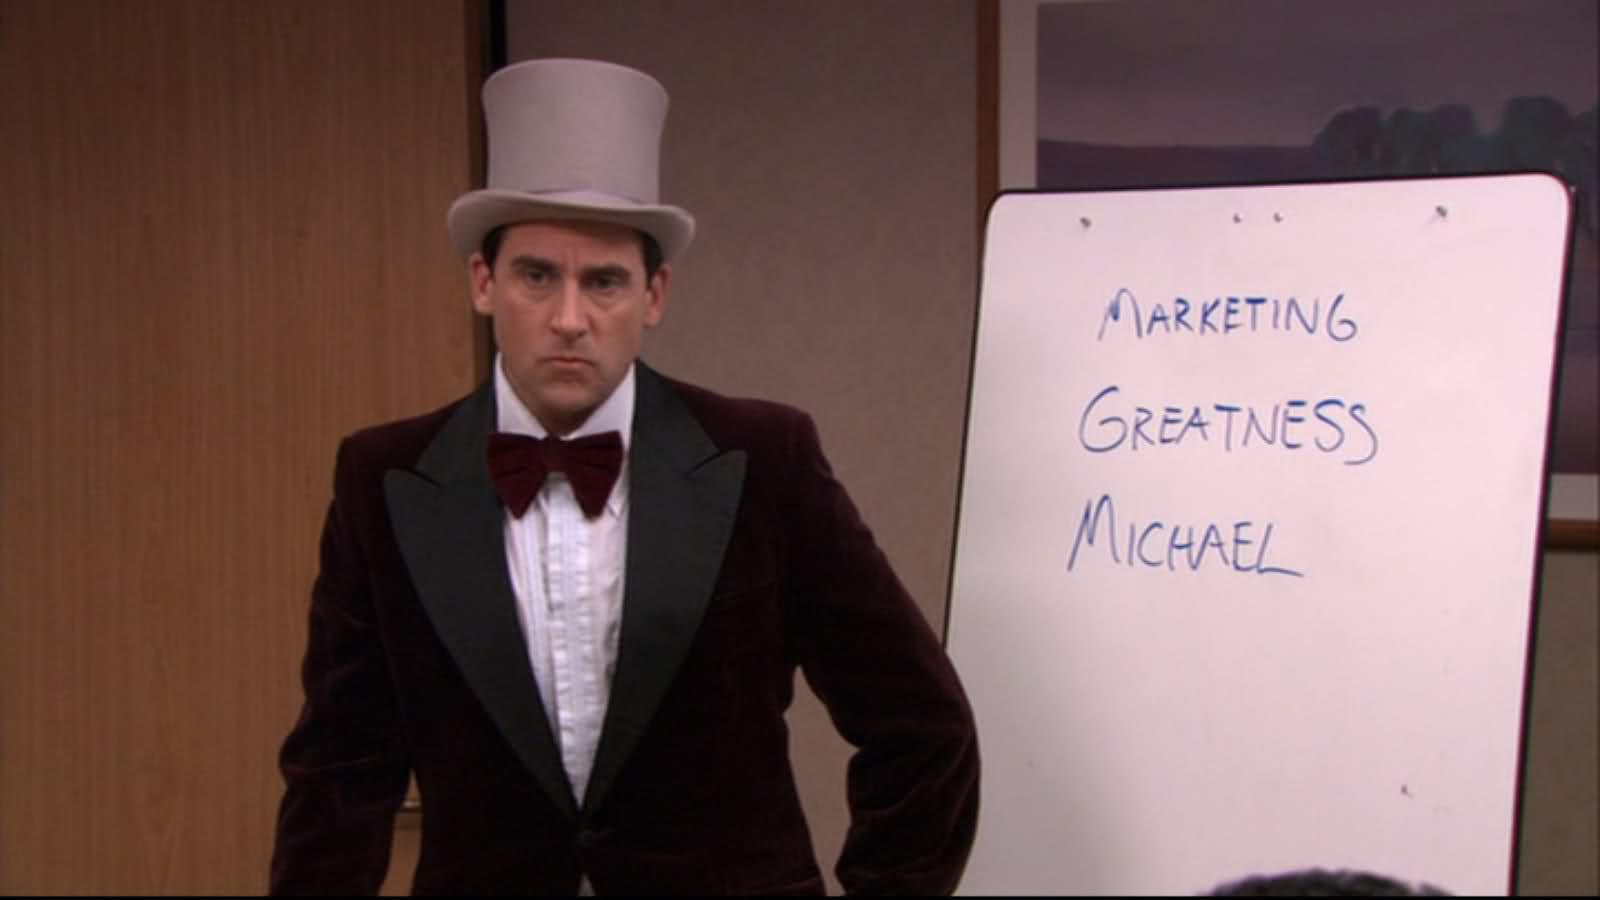 Marketing Greatness Michael